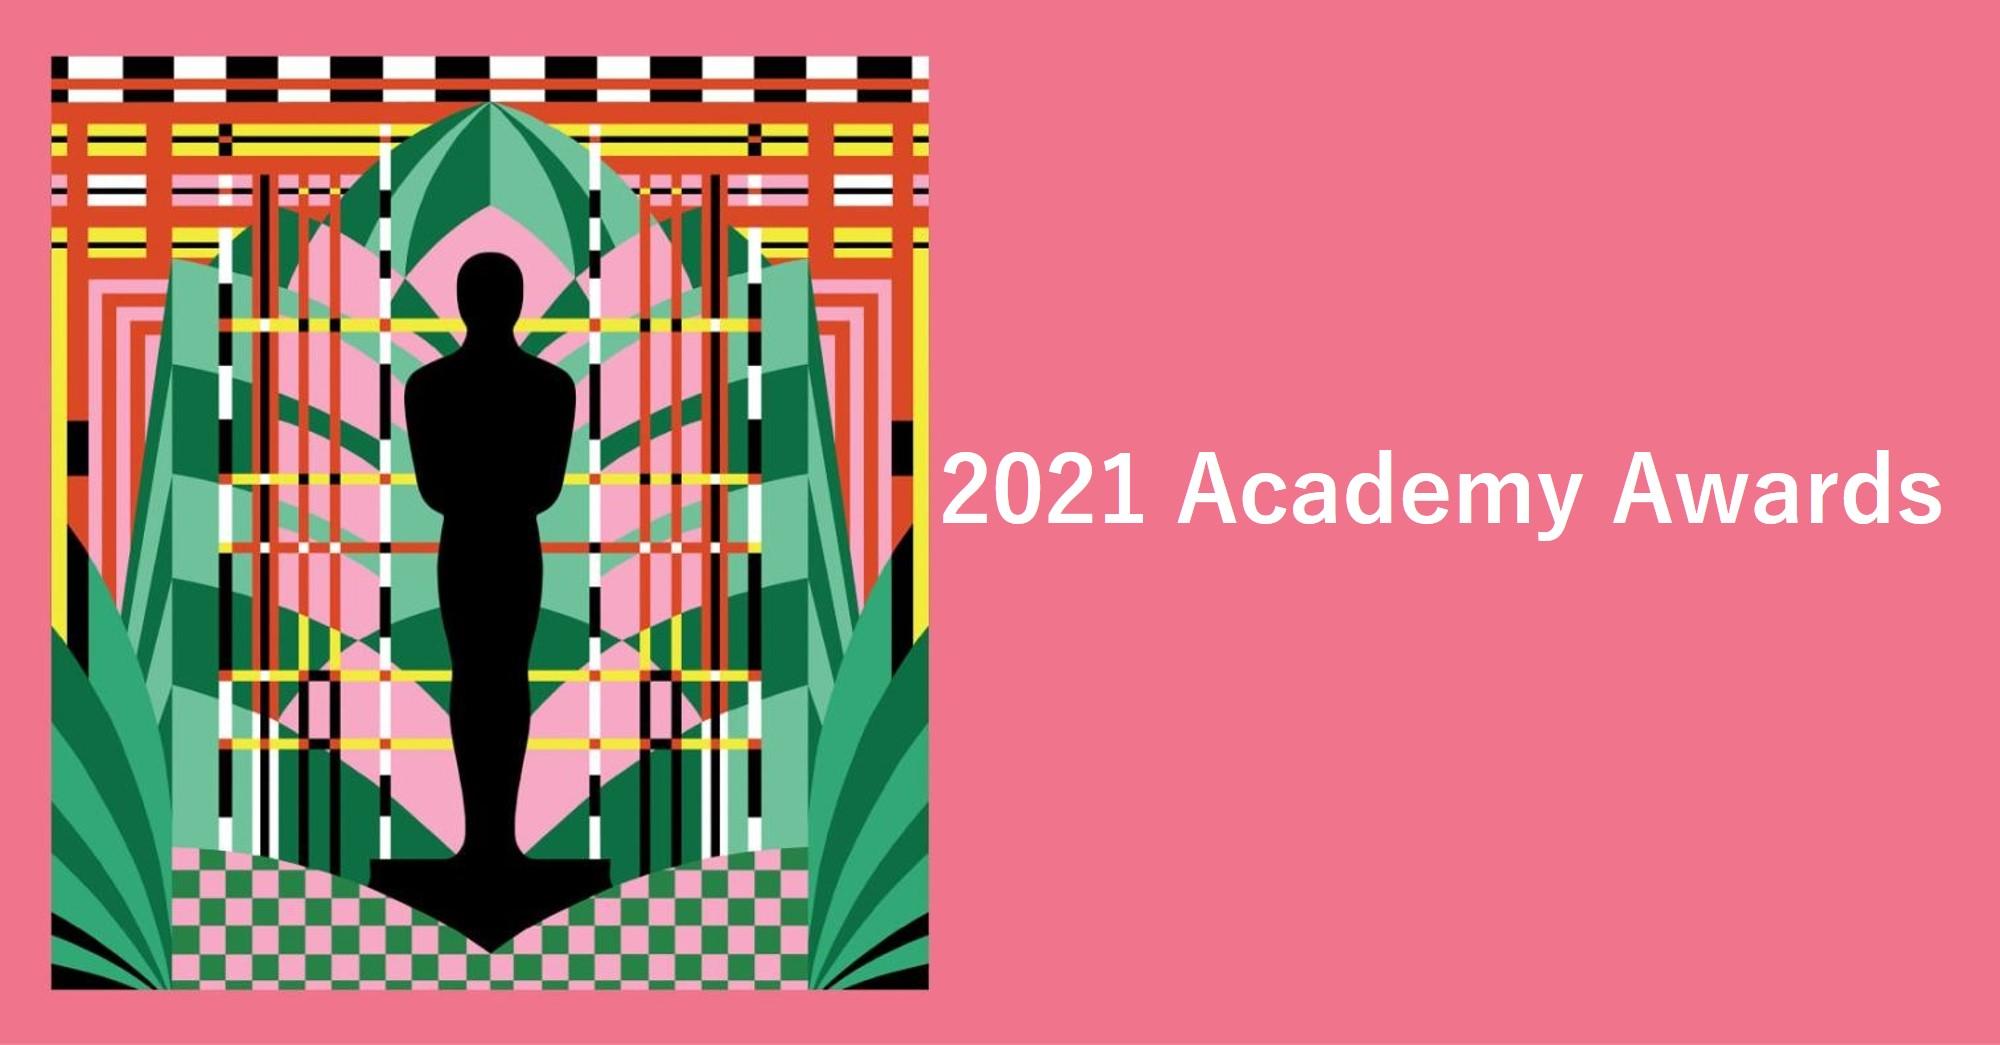 2021 Academy賞授賞式の色